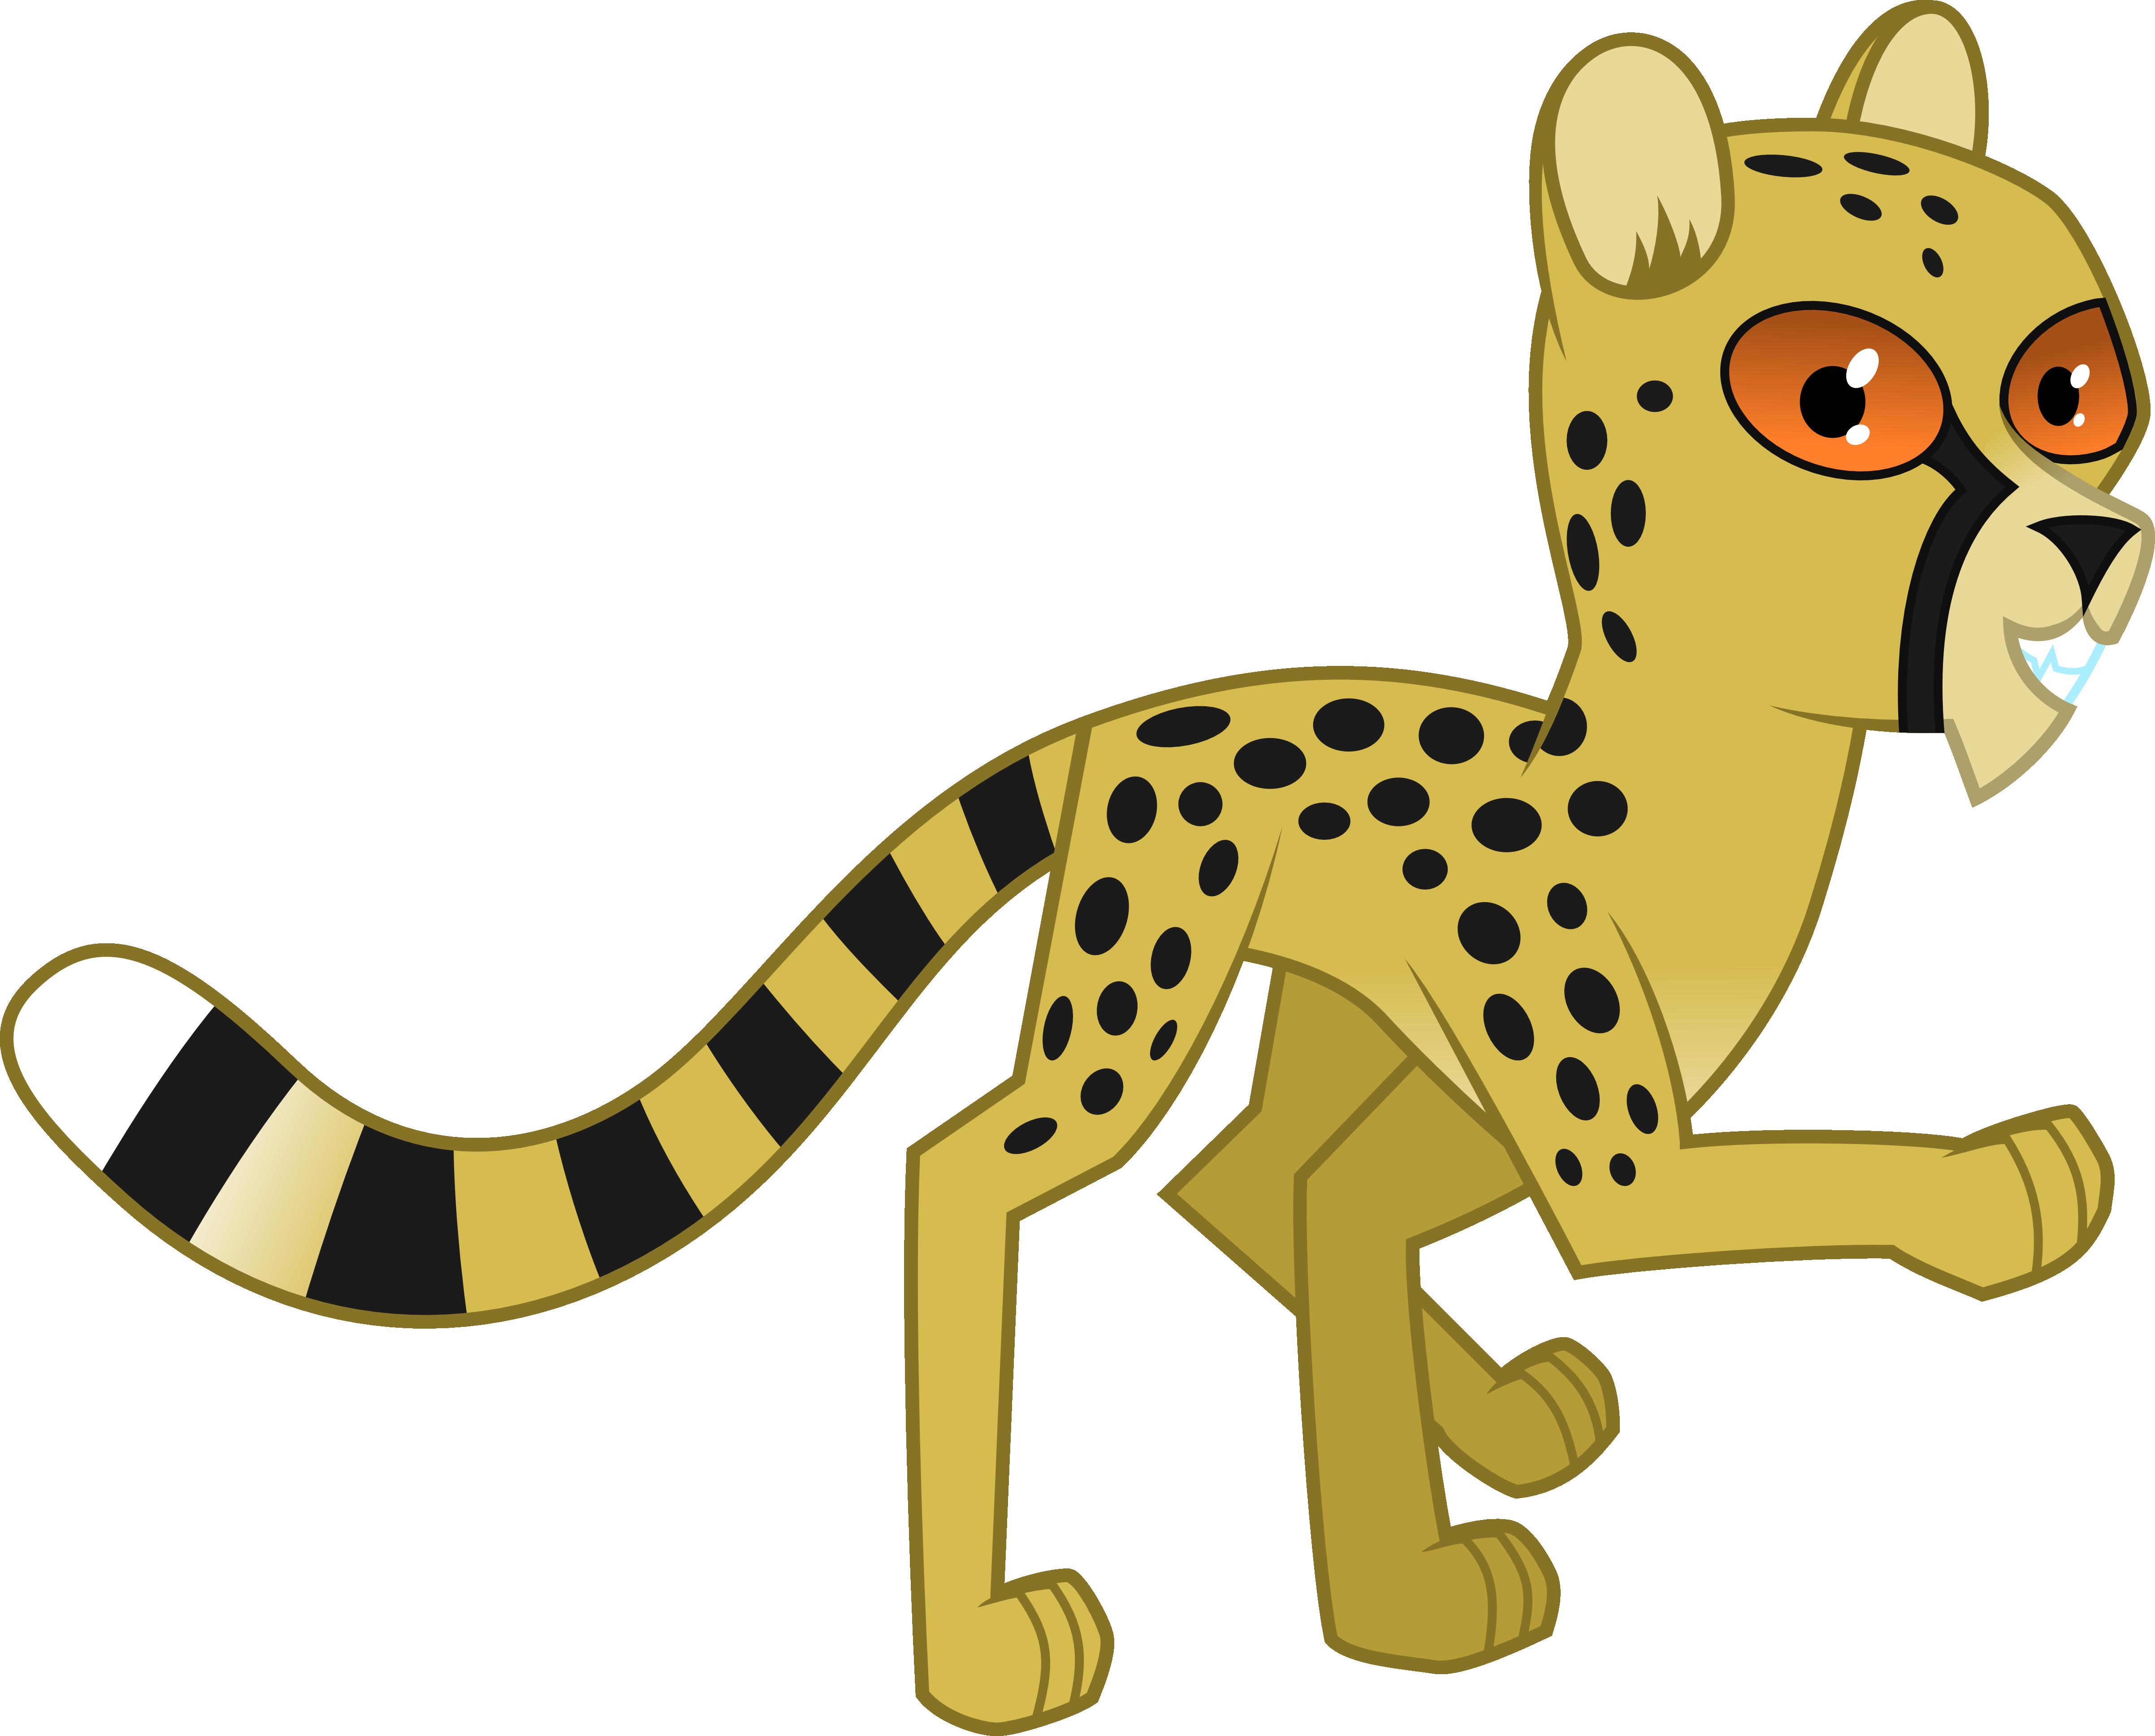 svg royalty free download Cheetah Running Clipart at GetDrawings